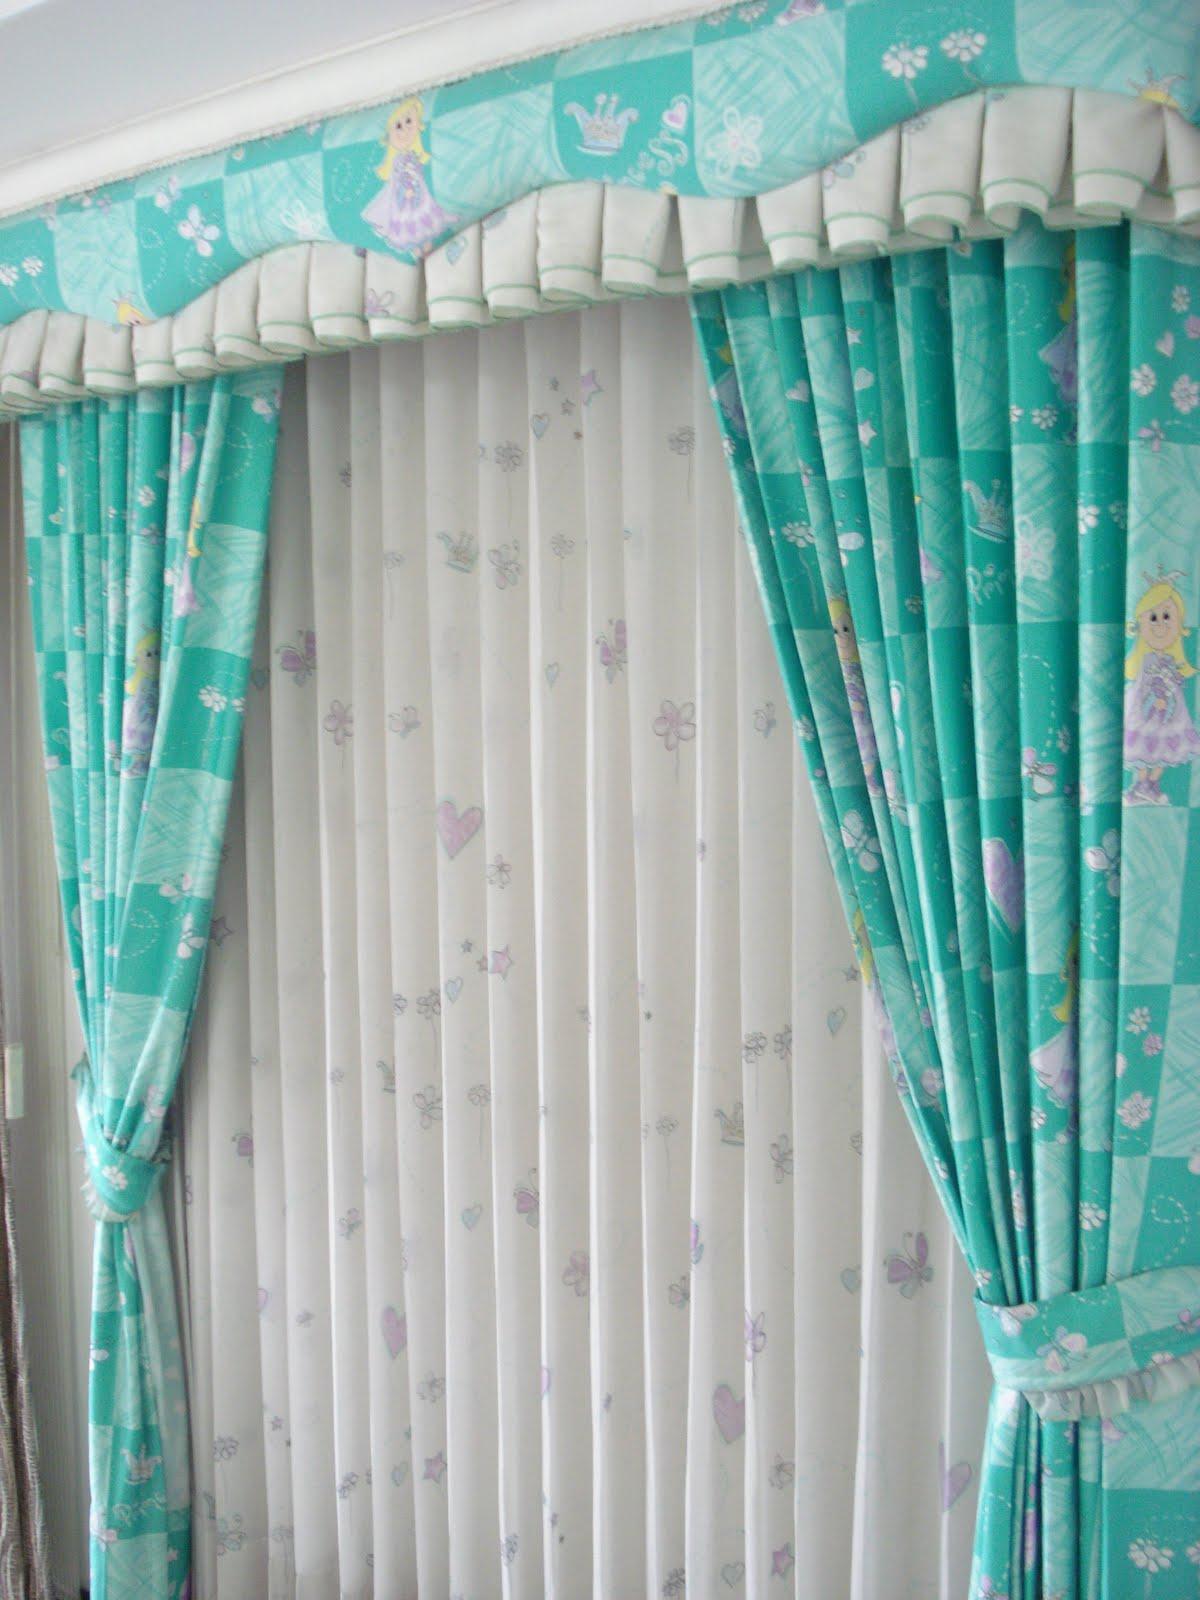 Accesorios para el hogar zajema cortinas infantiles - Cortinas para habitacion infantil ...